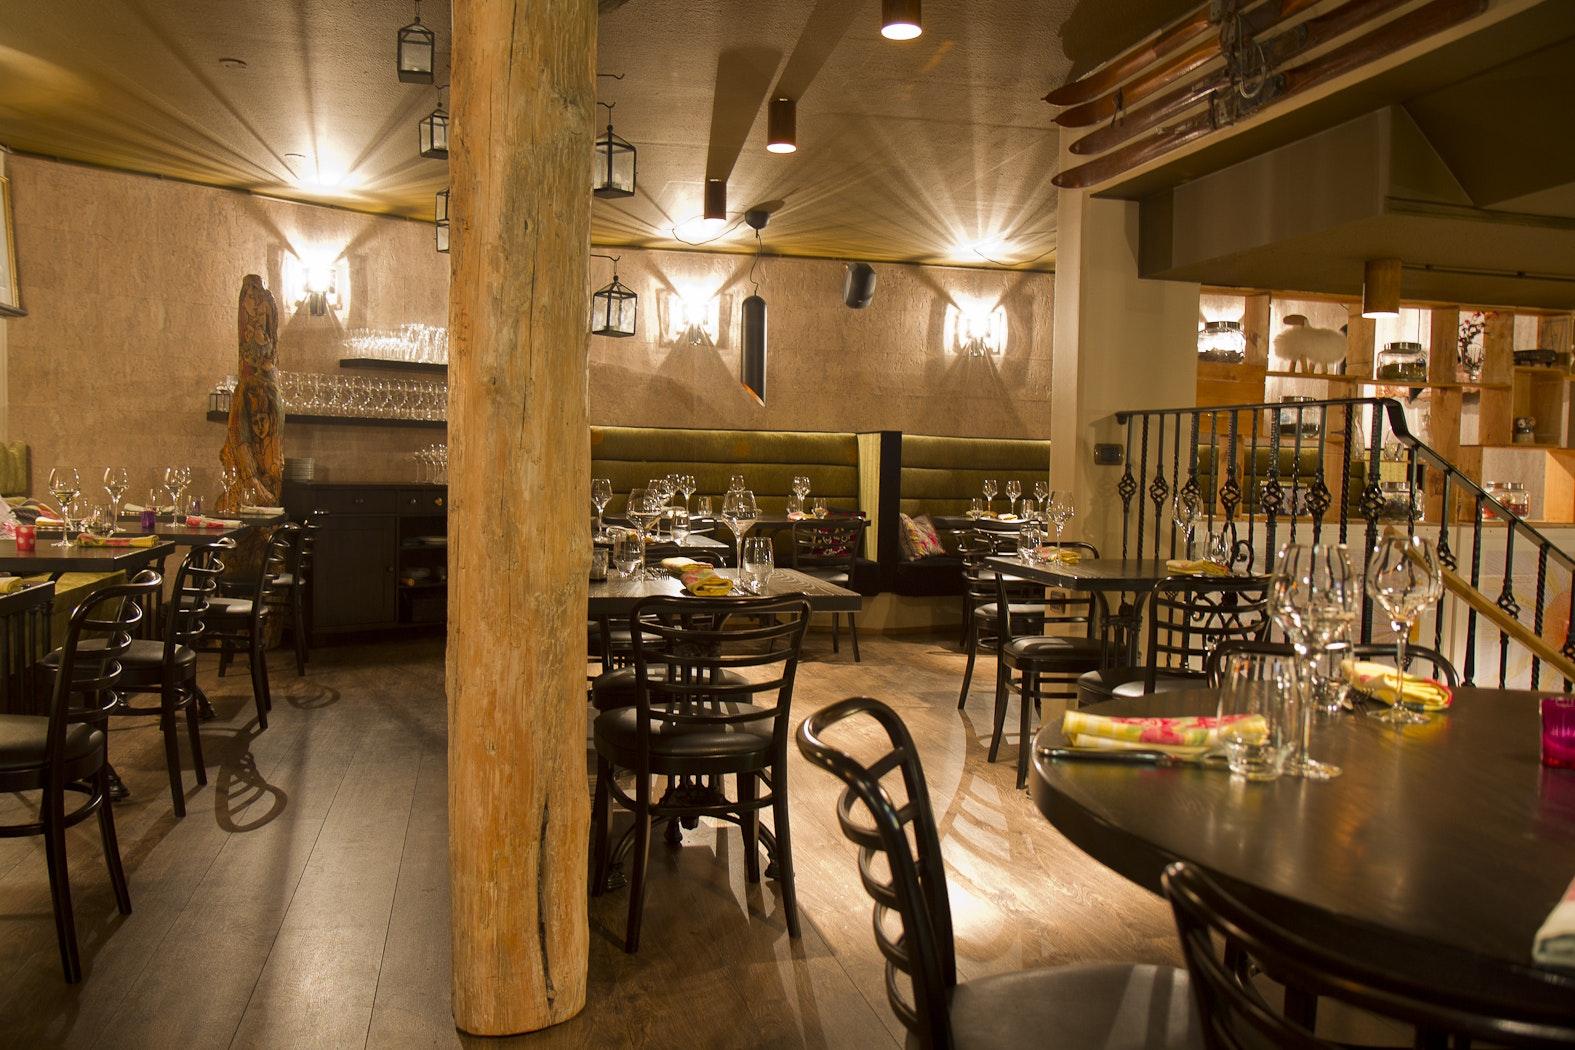 冰岛海鲜烧烤Seafood Grill餐厅